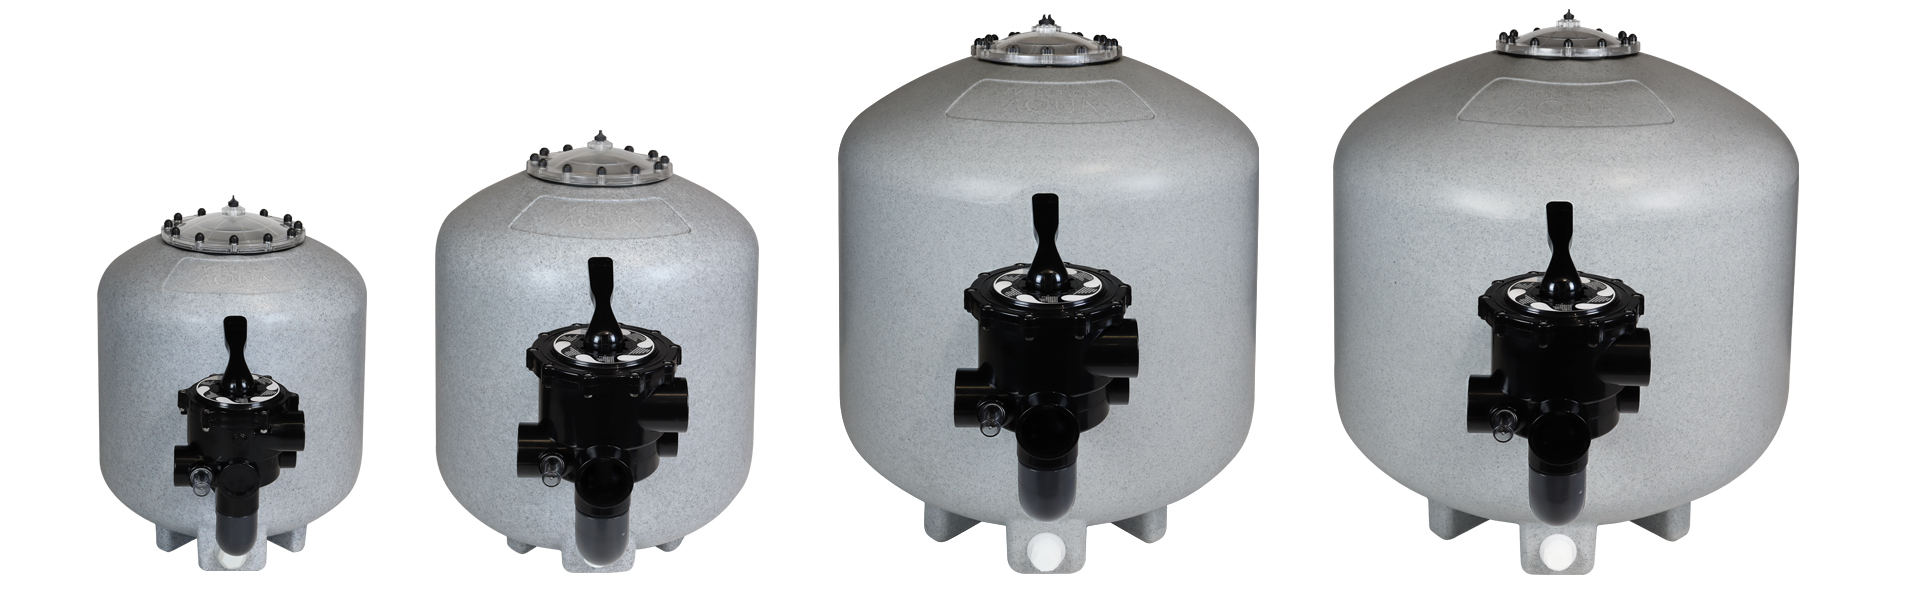 K Advanced Filters - Pressure filters range